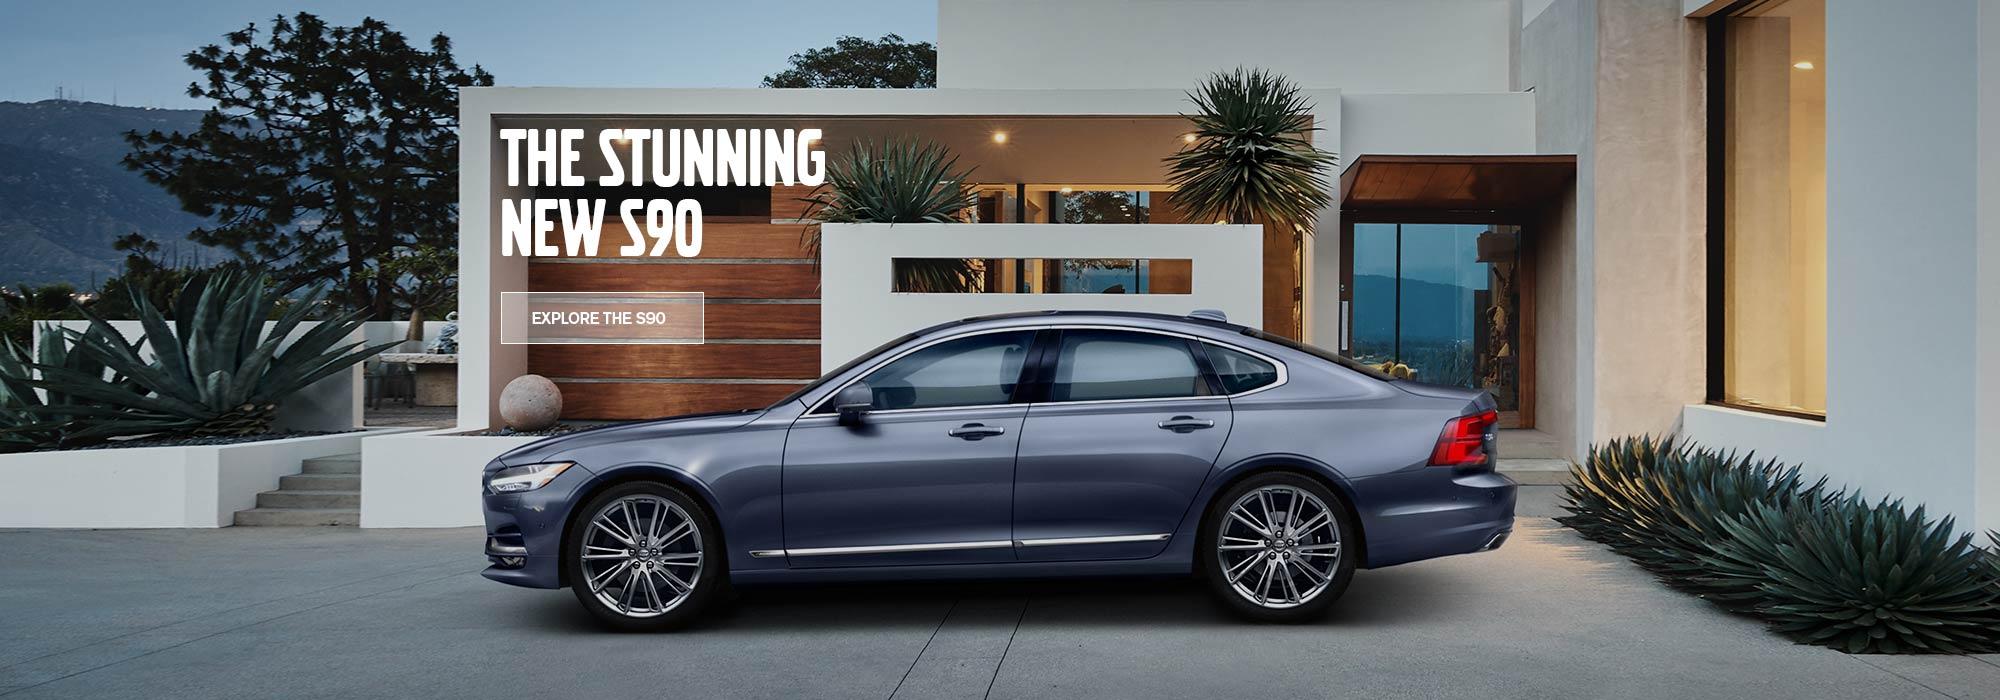 The stunning new S90